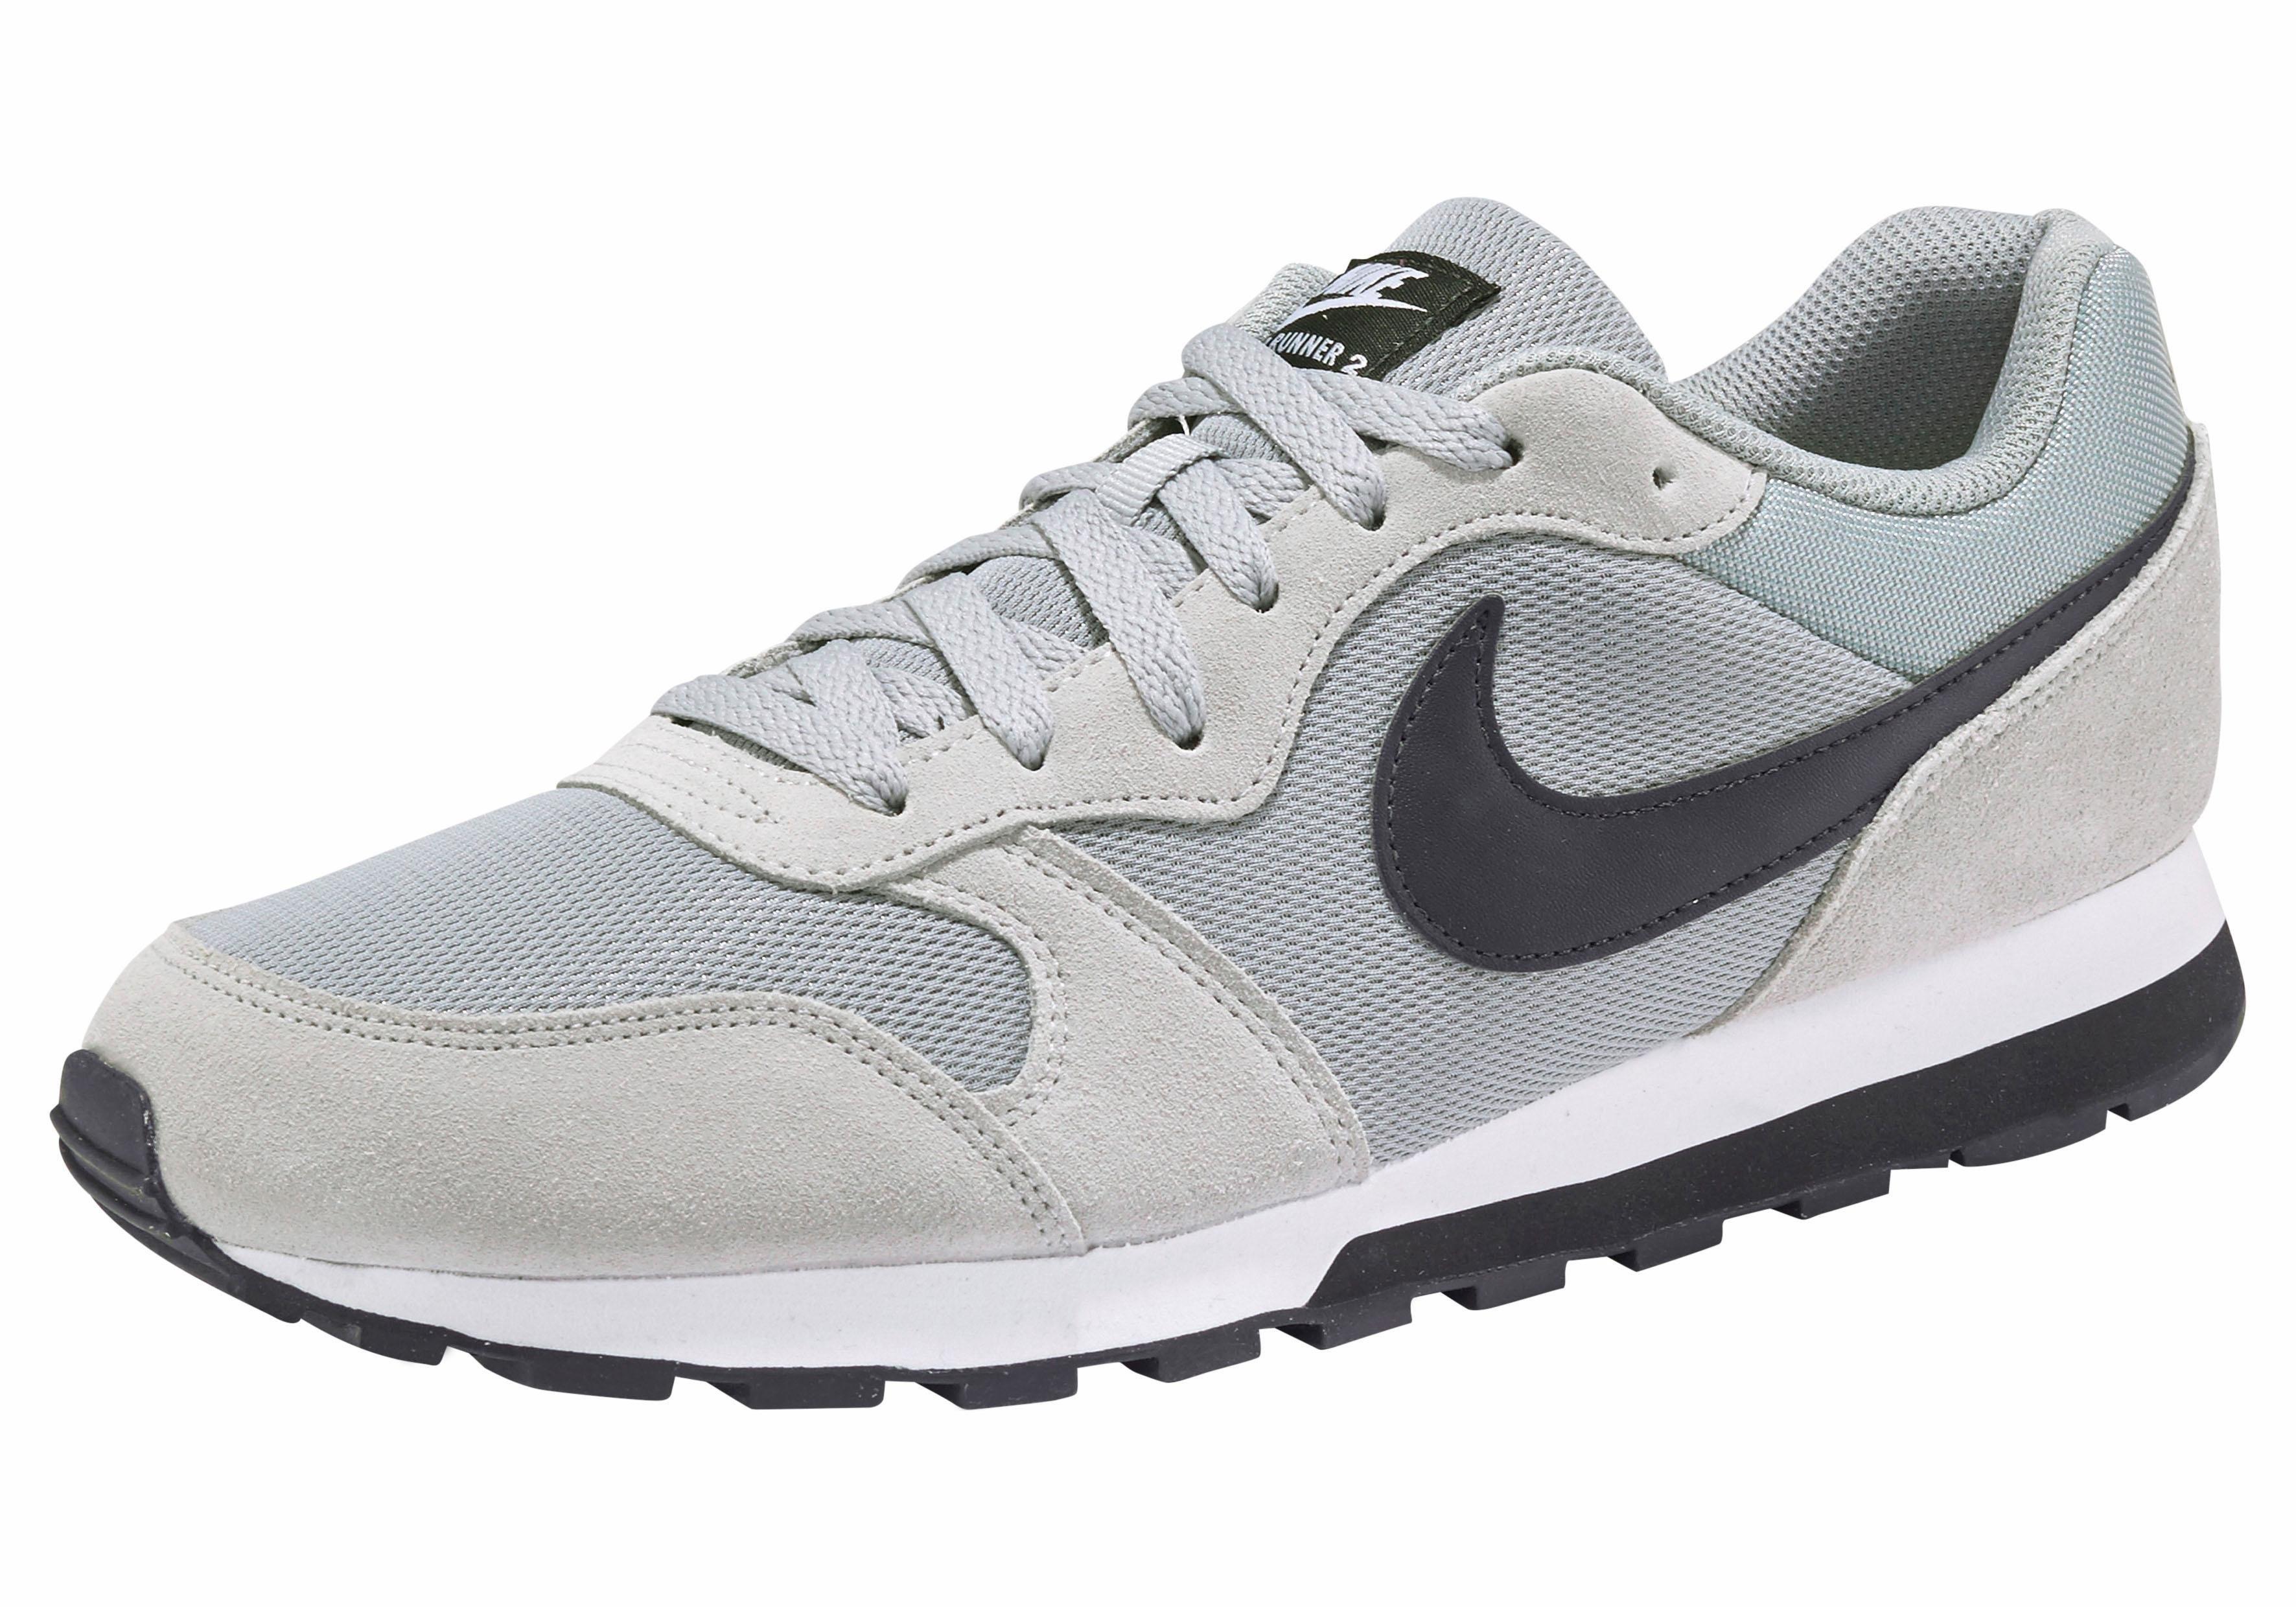 e8e3de5e3ad ... NIKE Sneakers MD Runner 2, NIKE Sneakers MD Runner 2 Wmns, Nike  Sportswear sneakers »Wmns MD Runner 2«, Nike Sportswear sneakers »Wmns MD  Runner 2«, ...